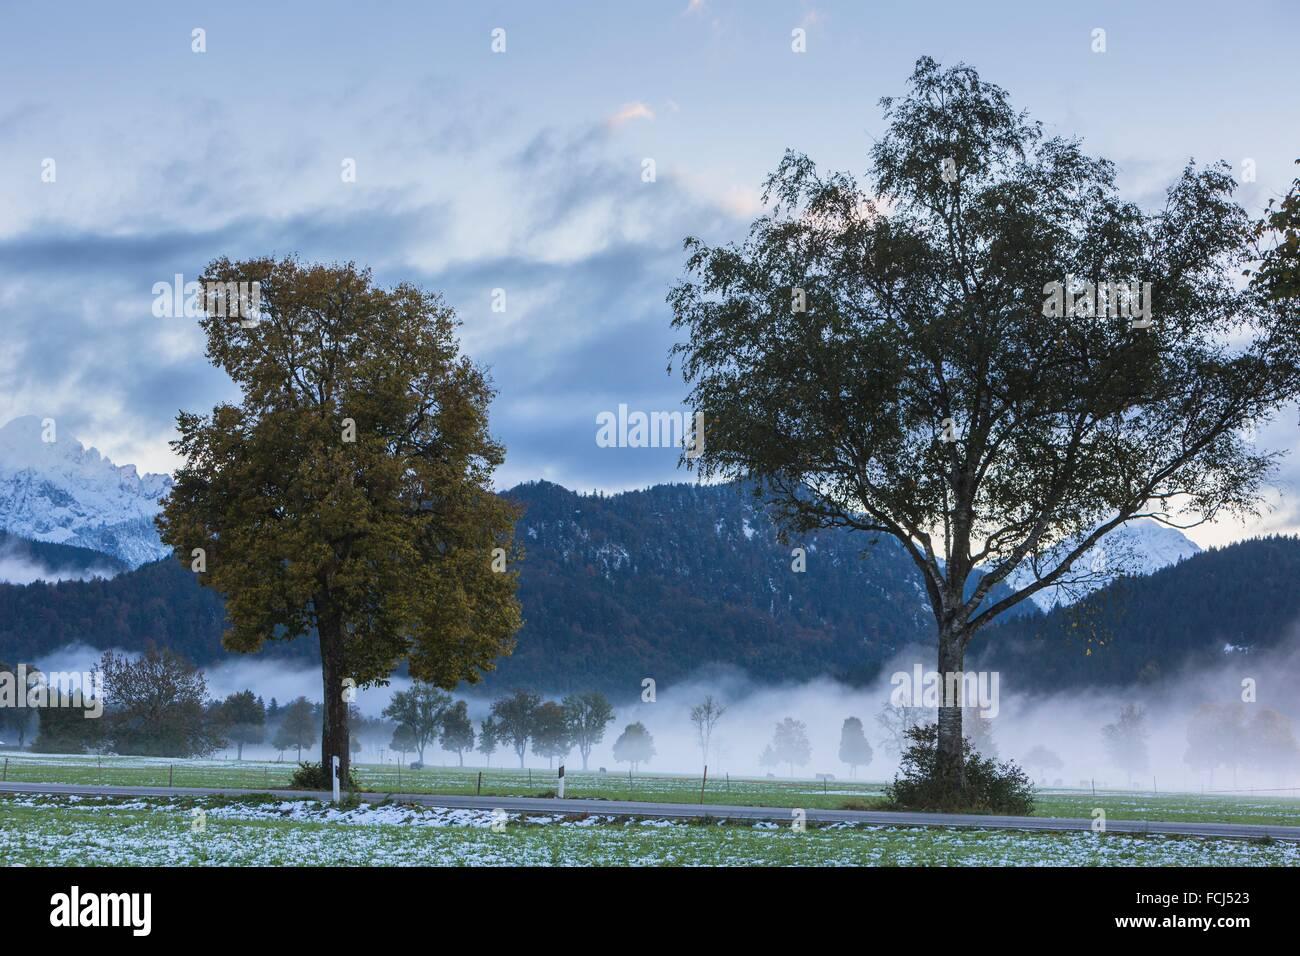 Trees and wintery landscape at dusk, Bavaria, Germany, Europe - Stock Image